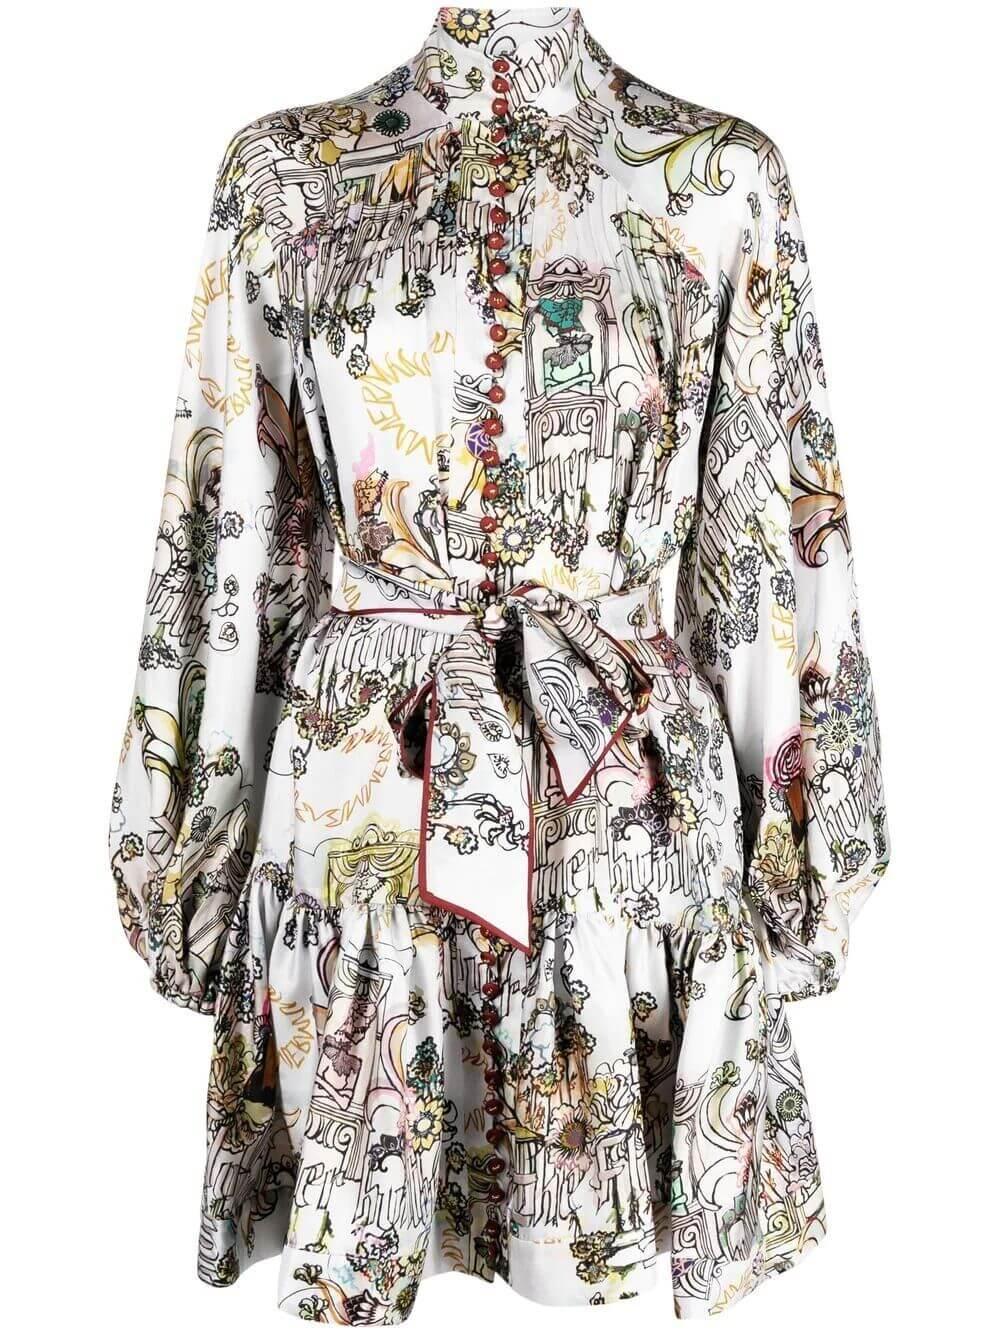 Botanica Lantern Mini Dress Item # 1471DBOT